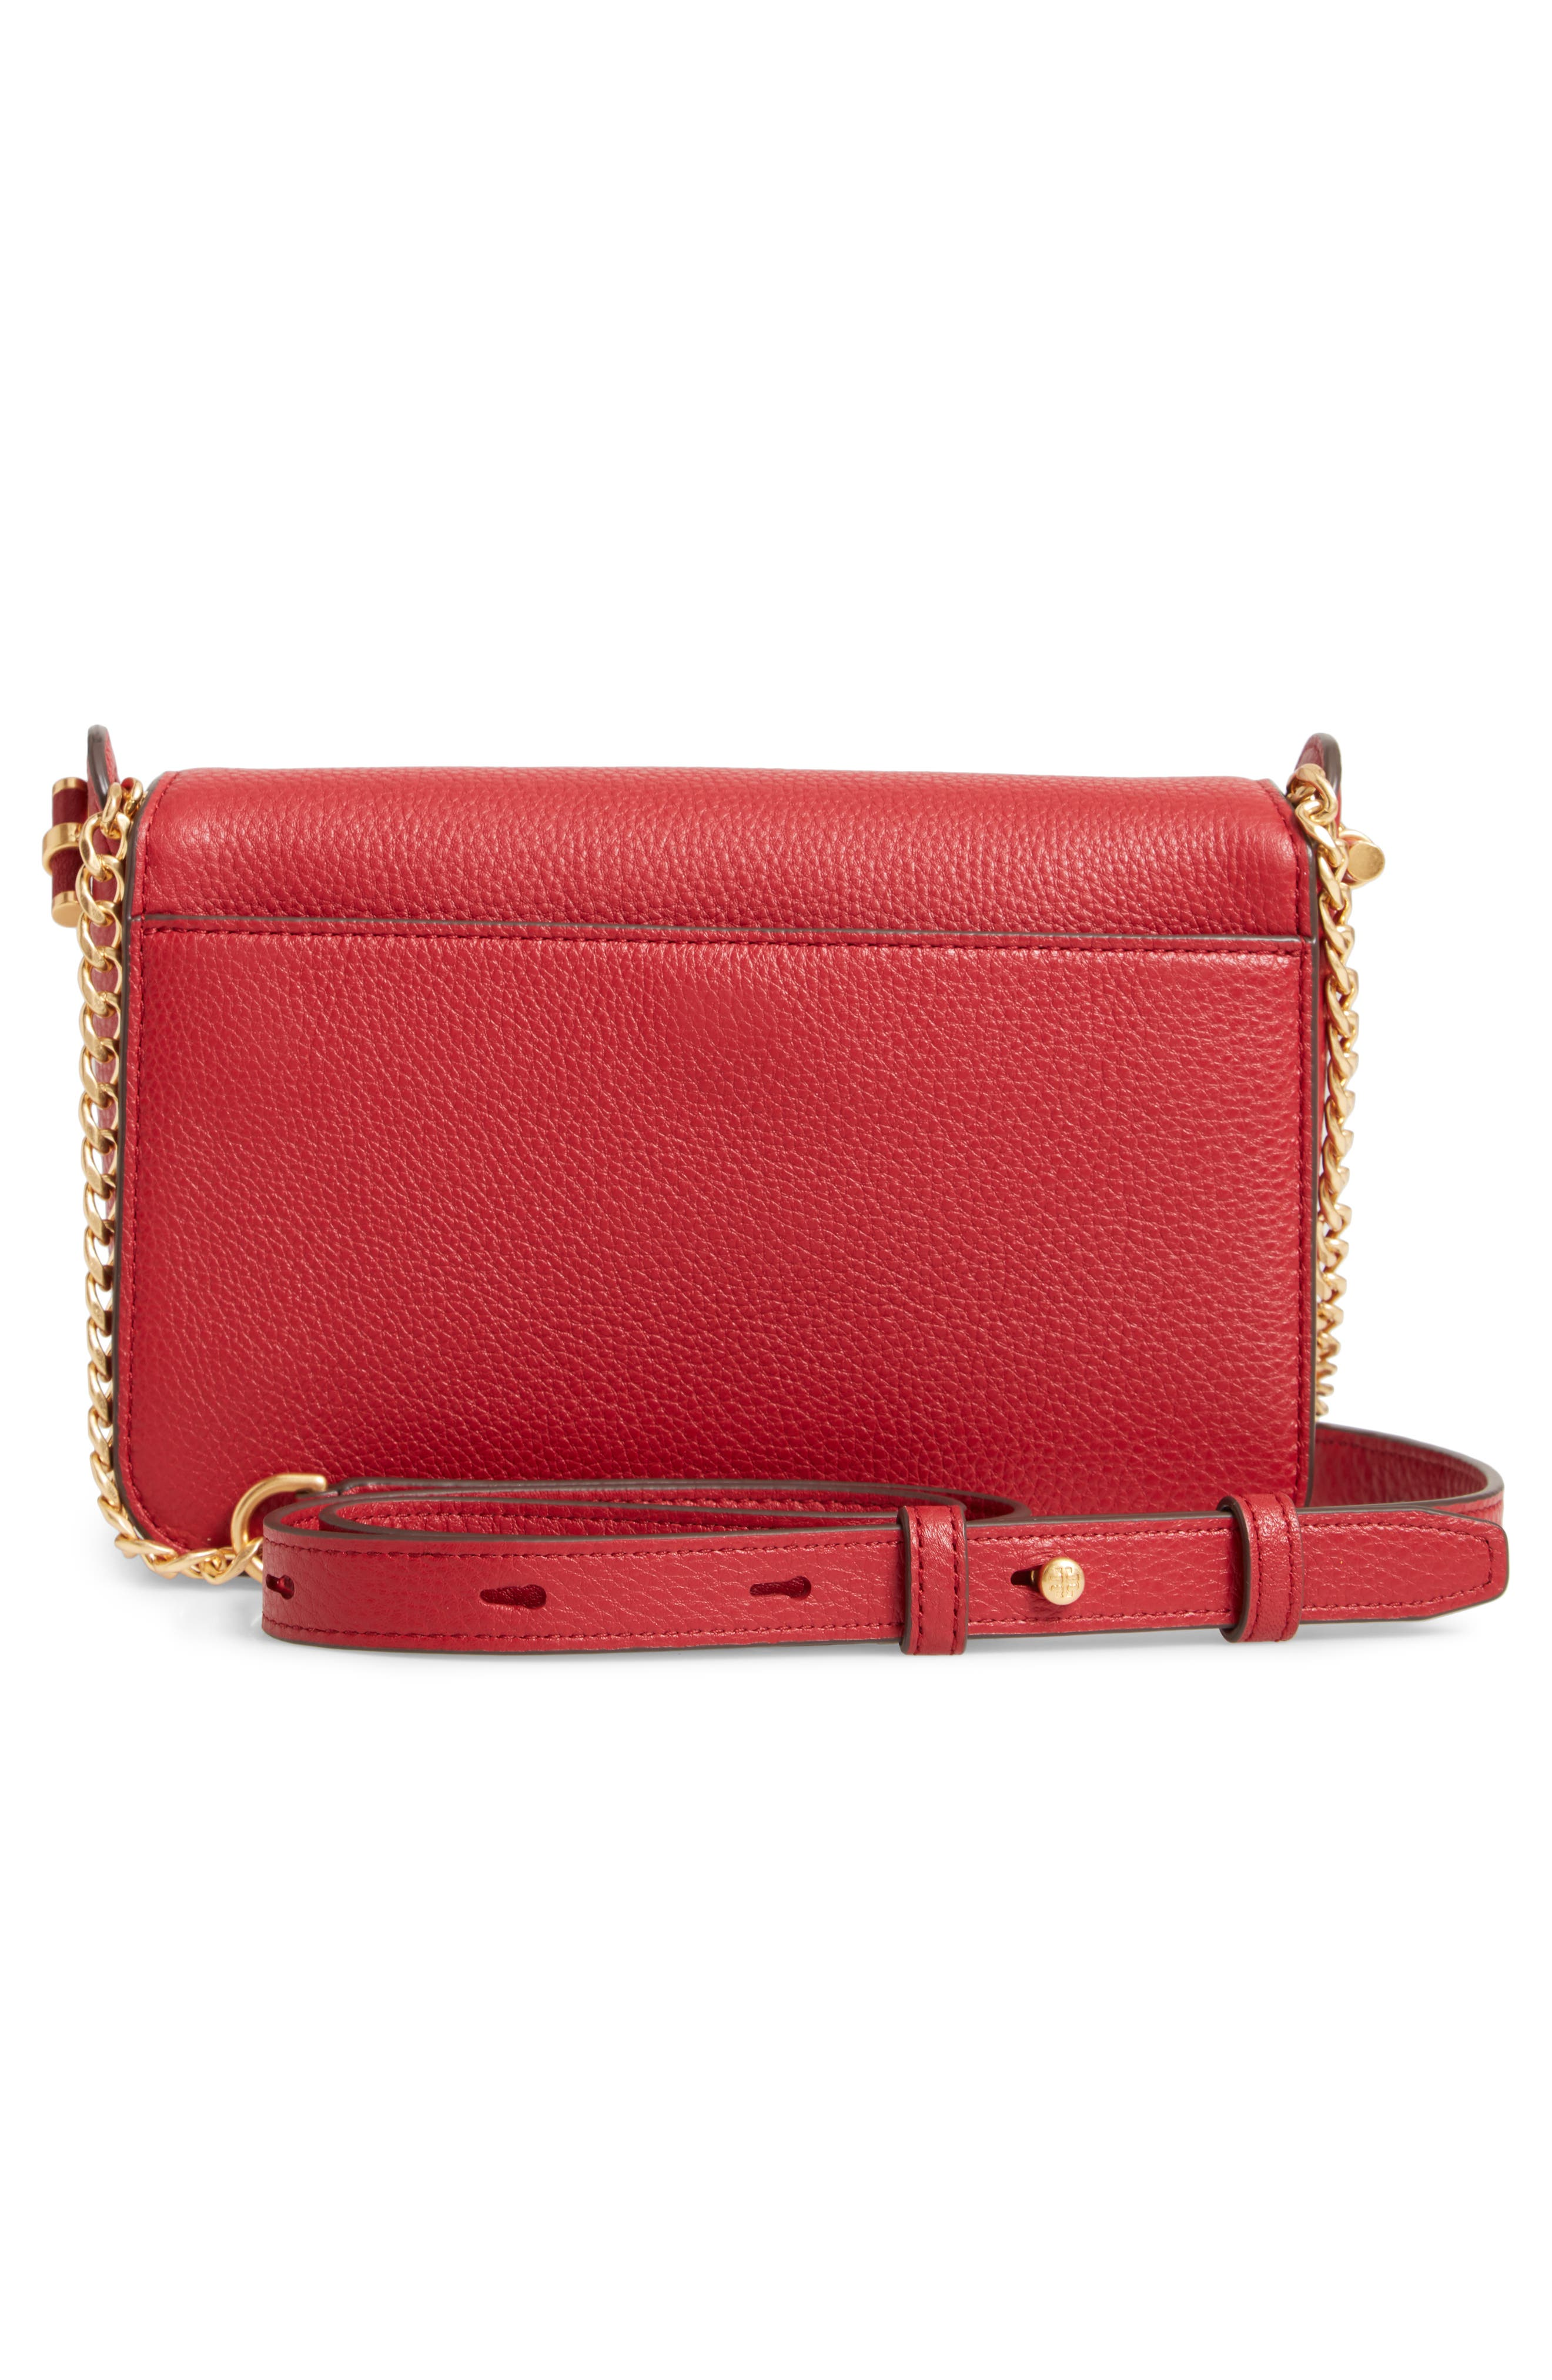 Chelsea Leather Crossbody Bag,                             Alternate thumbnail 3, color,                             REDSTONE